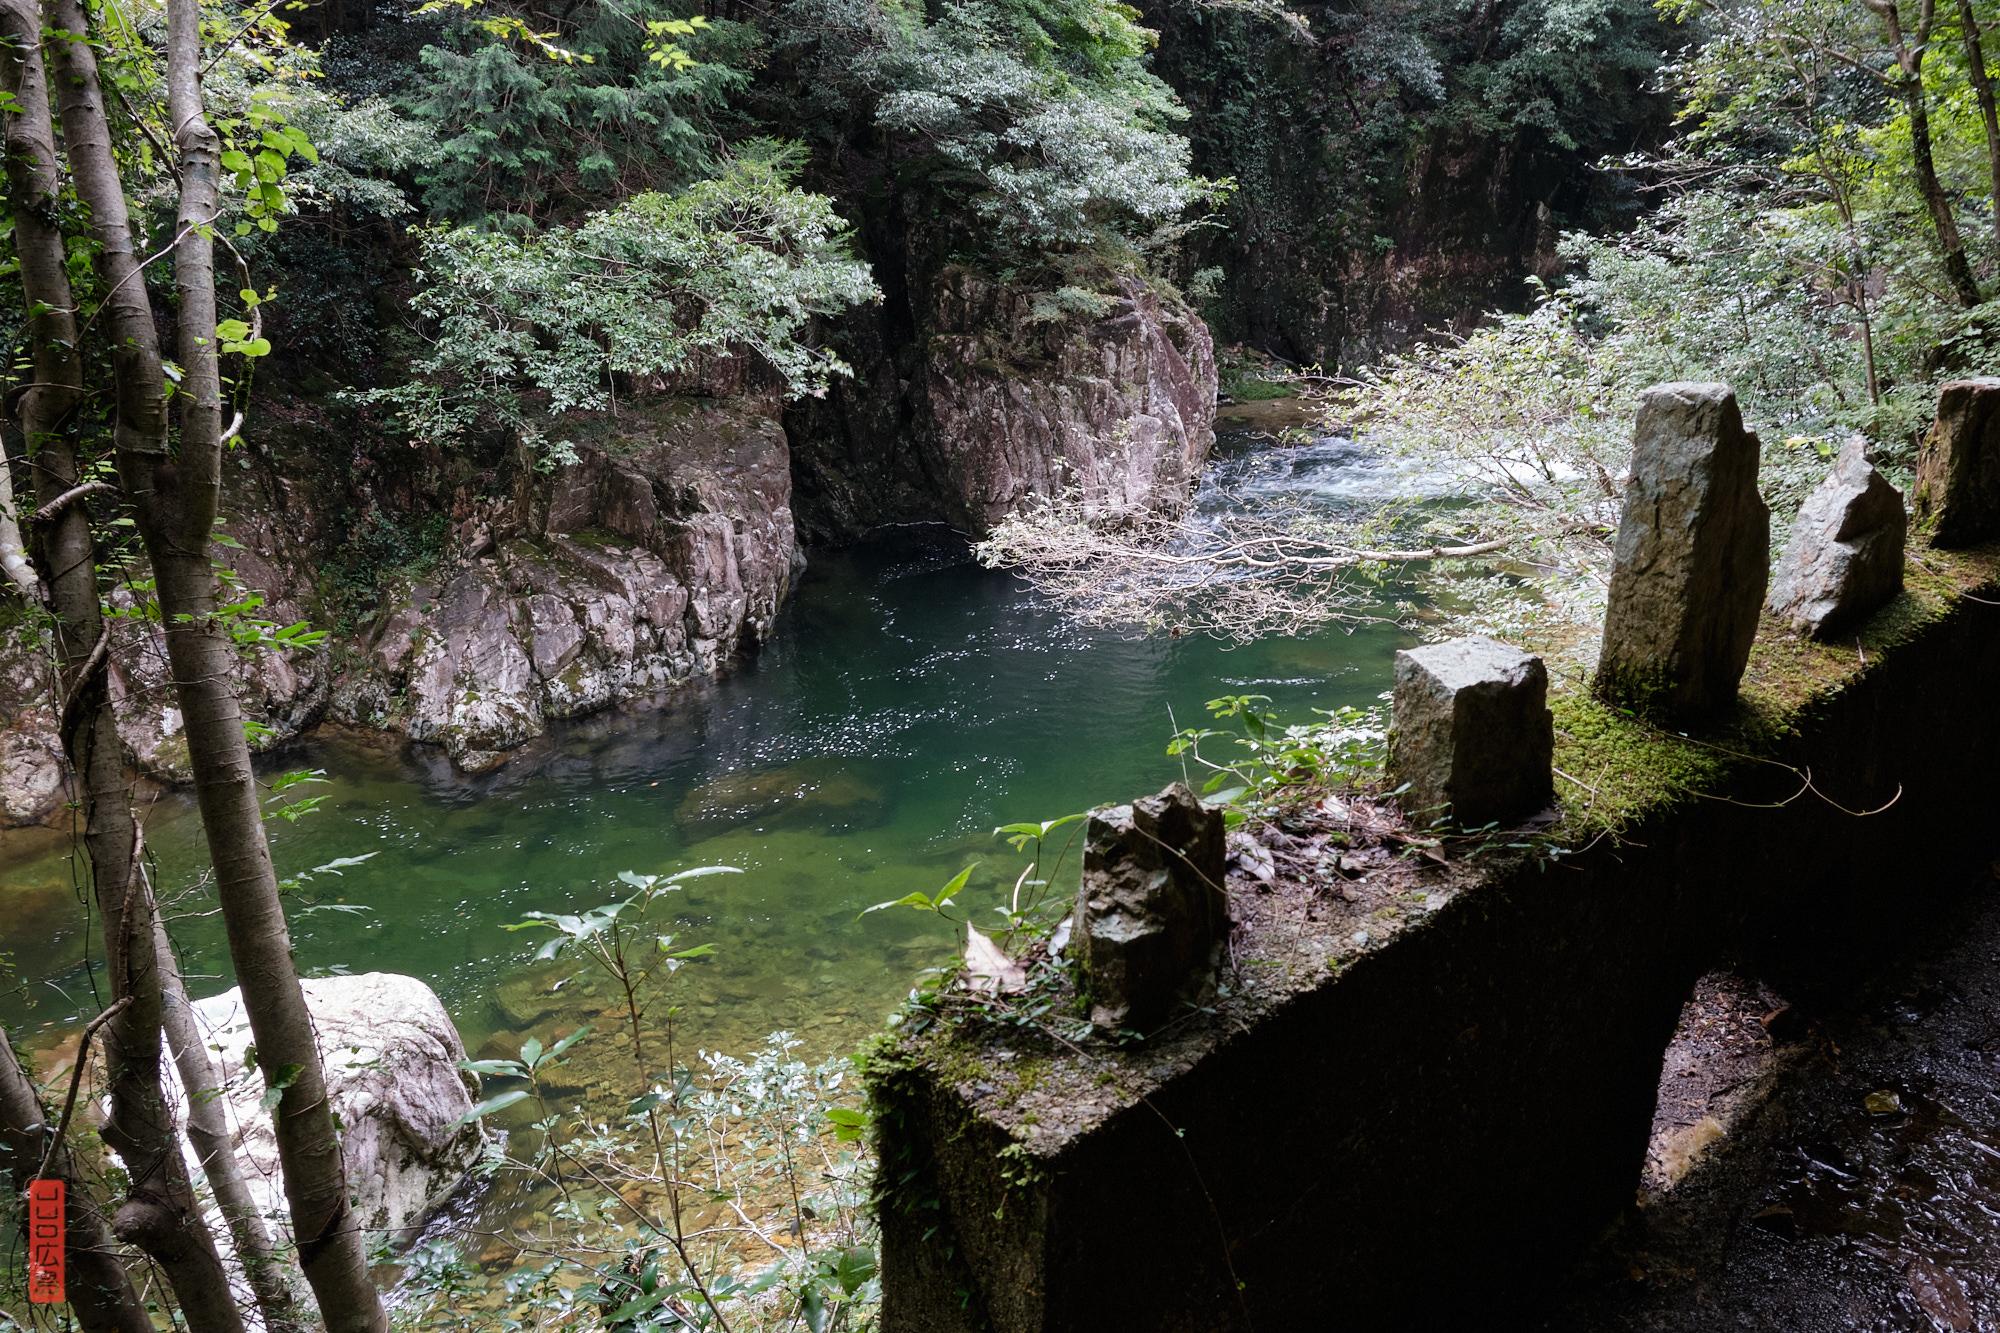 Sandankyo, Meotobuchi